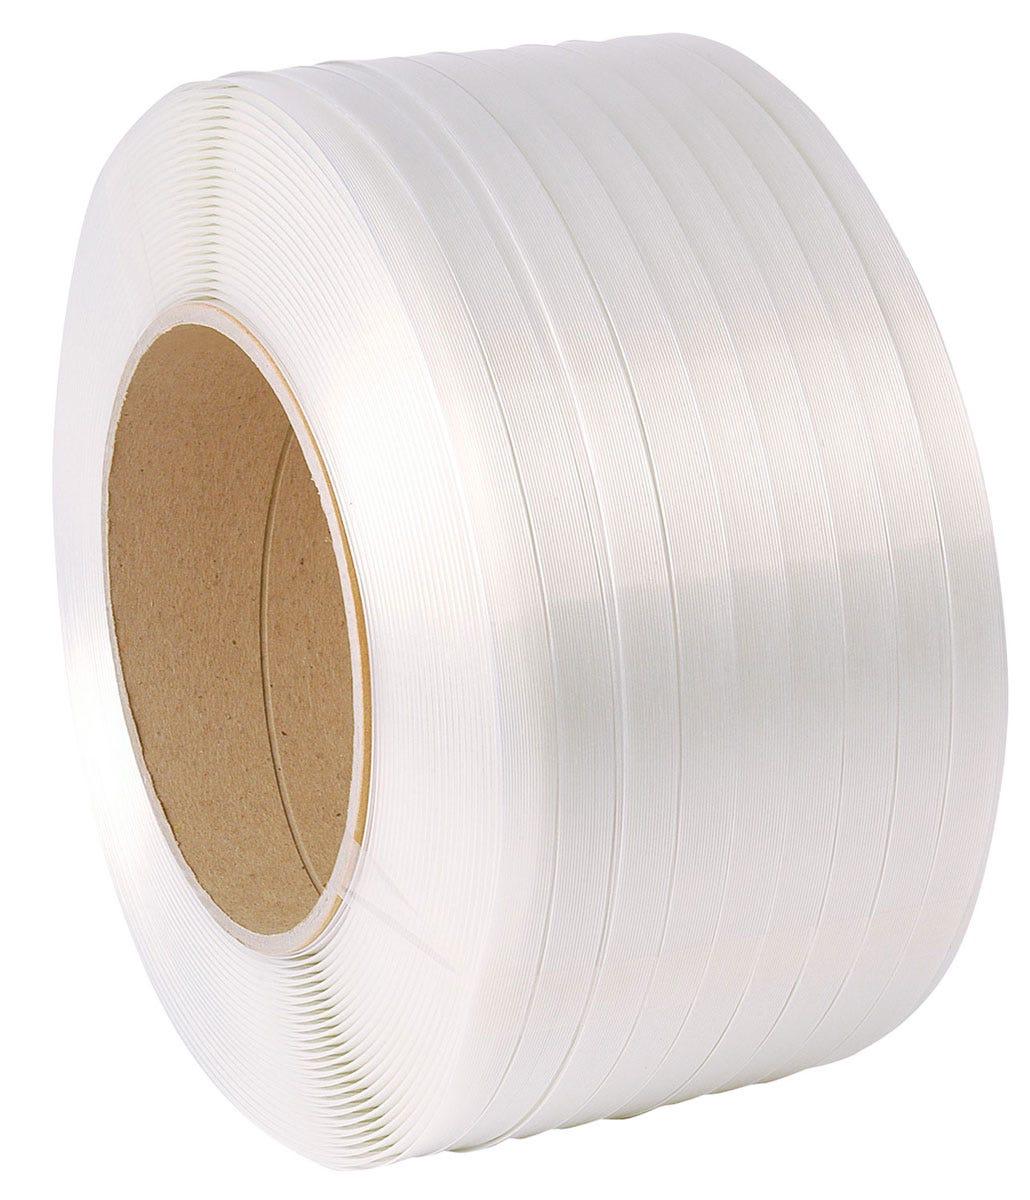 Safeguard® 16mm Composite Strap